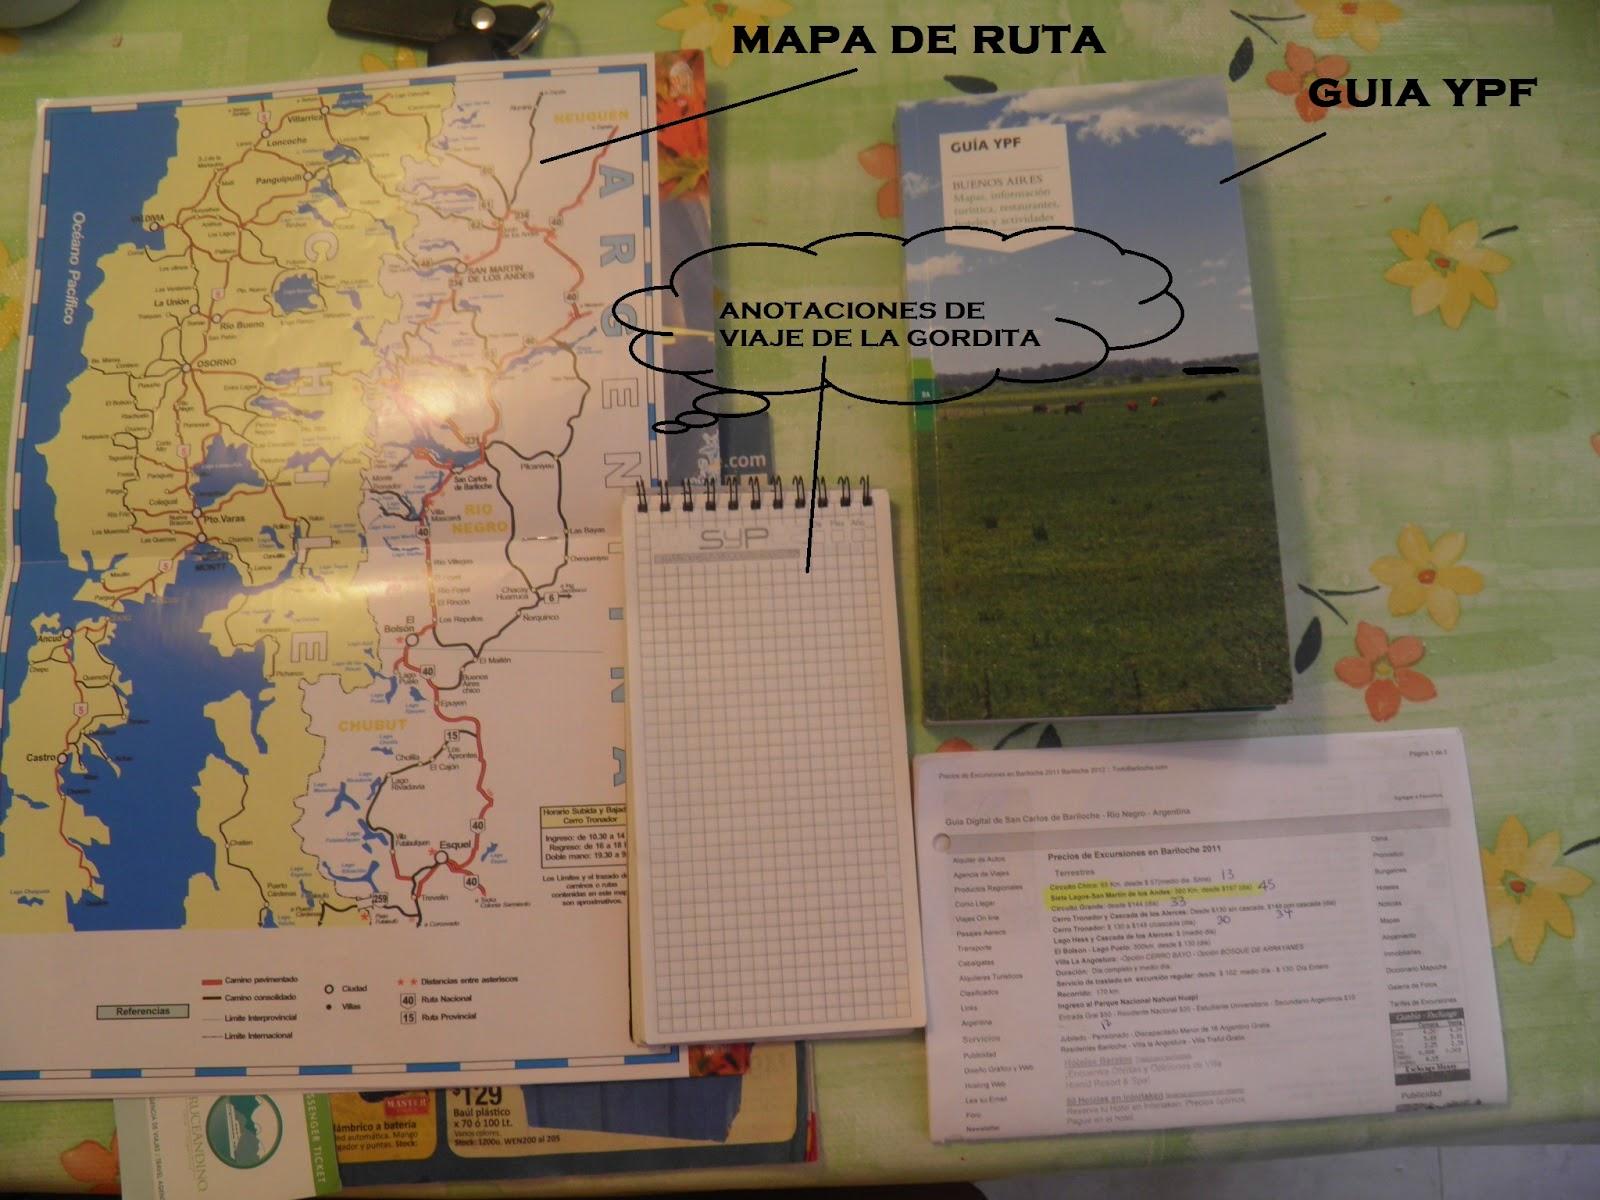 Vas A Viajar Al Extranjero La Sre Emite: Paseo Gomez 2012: Dias 6, 8 Y 9 Bariloche